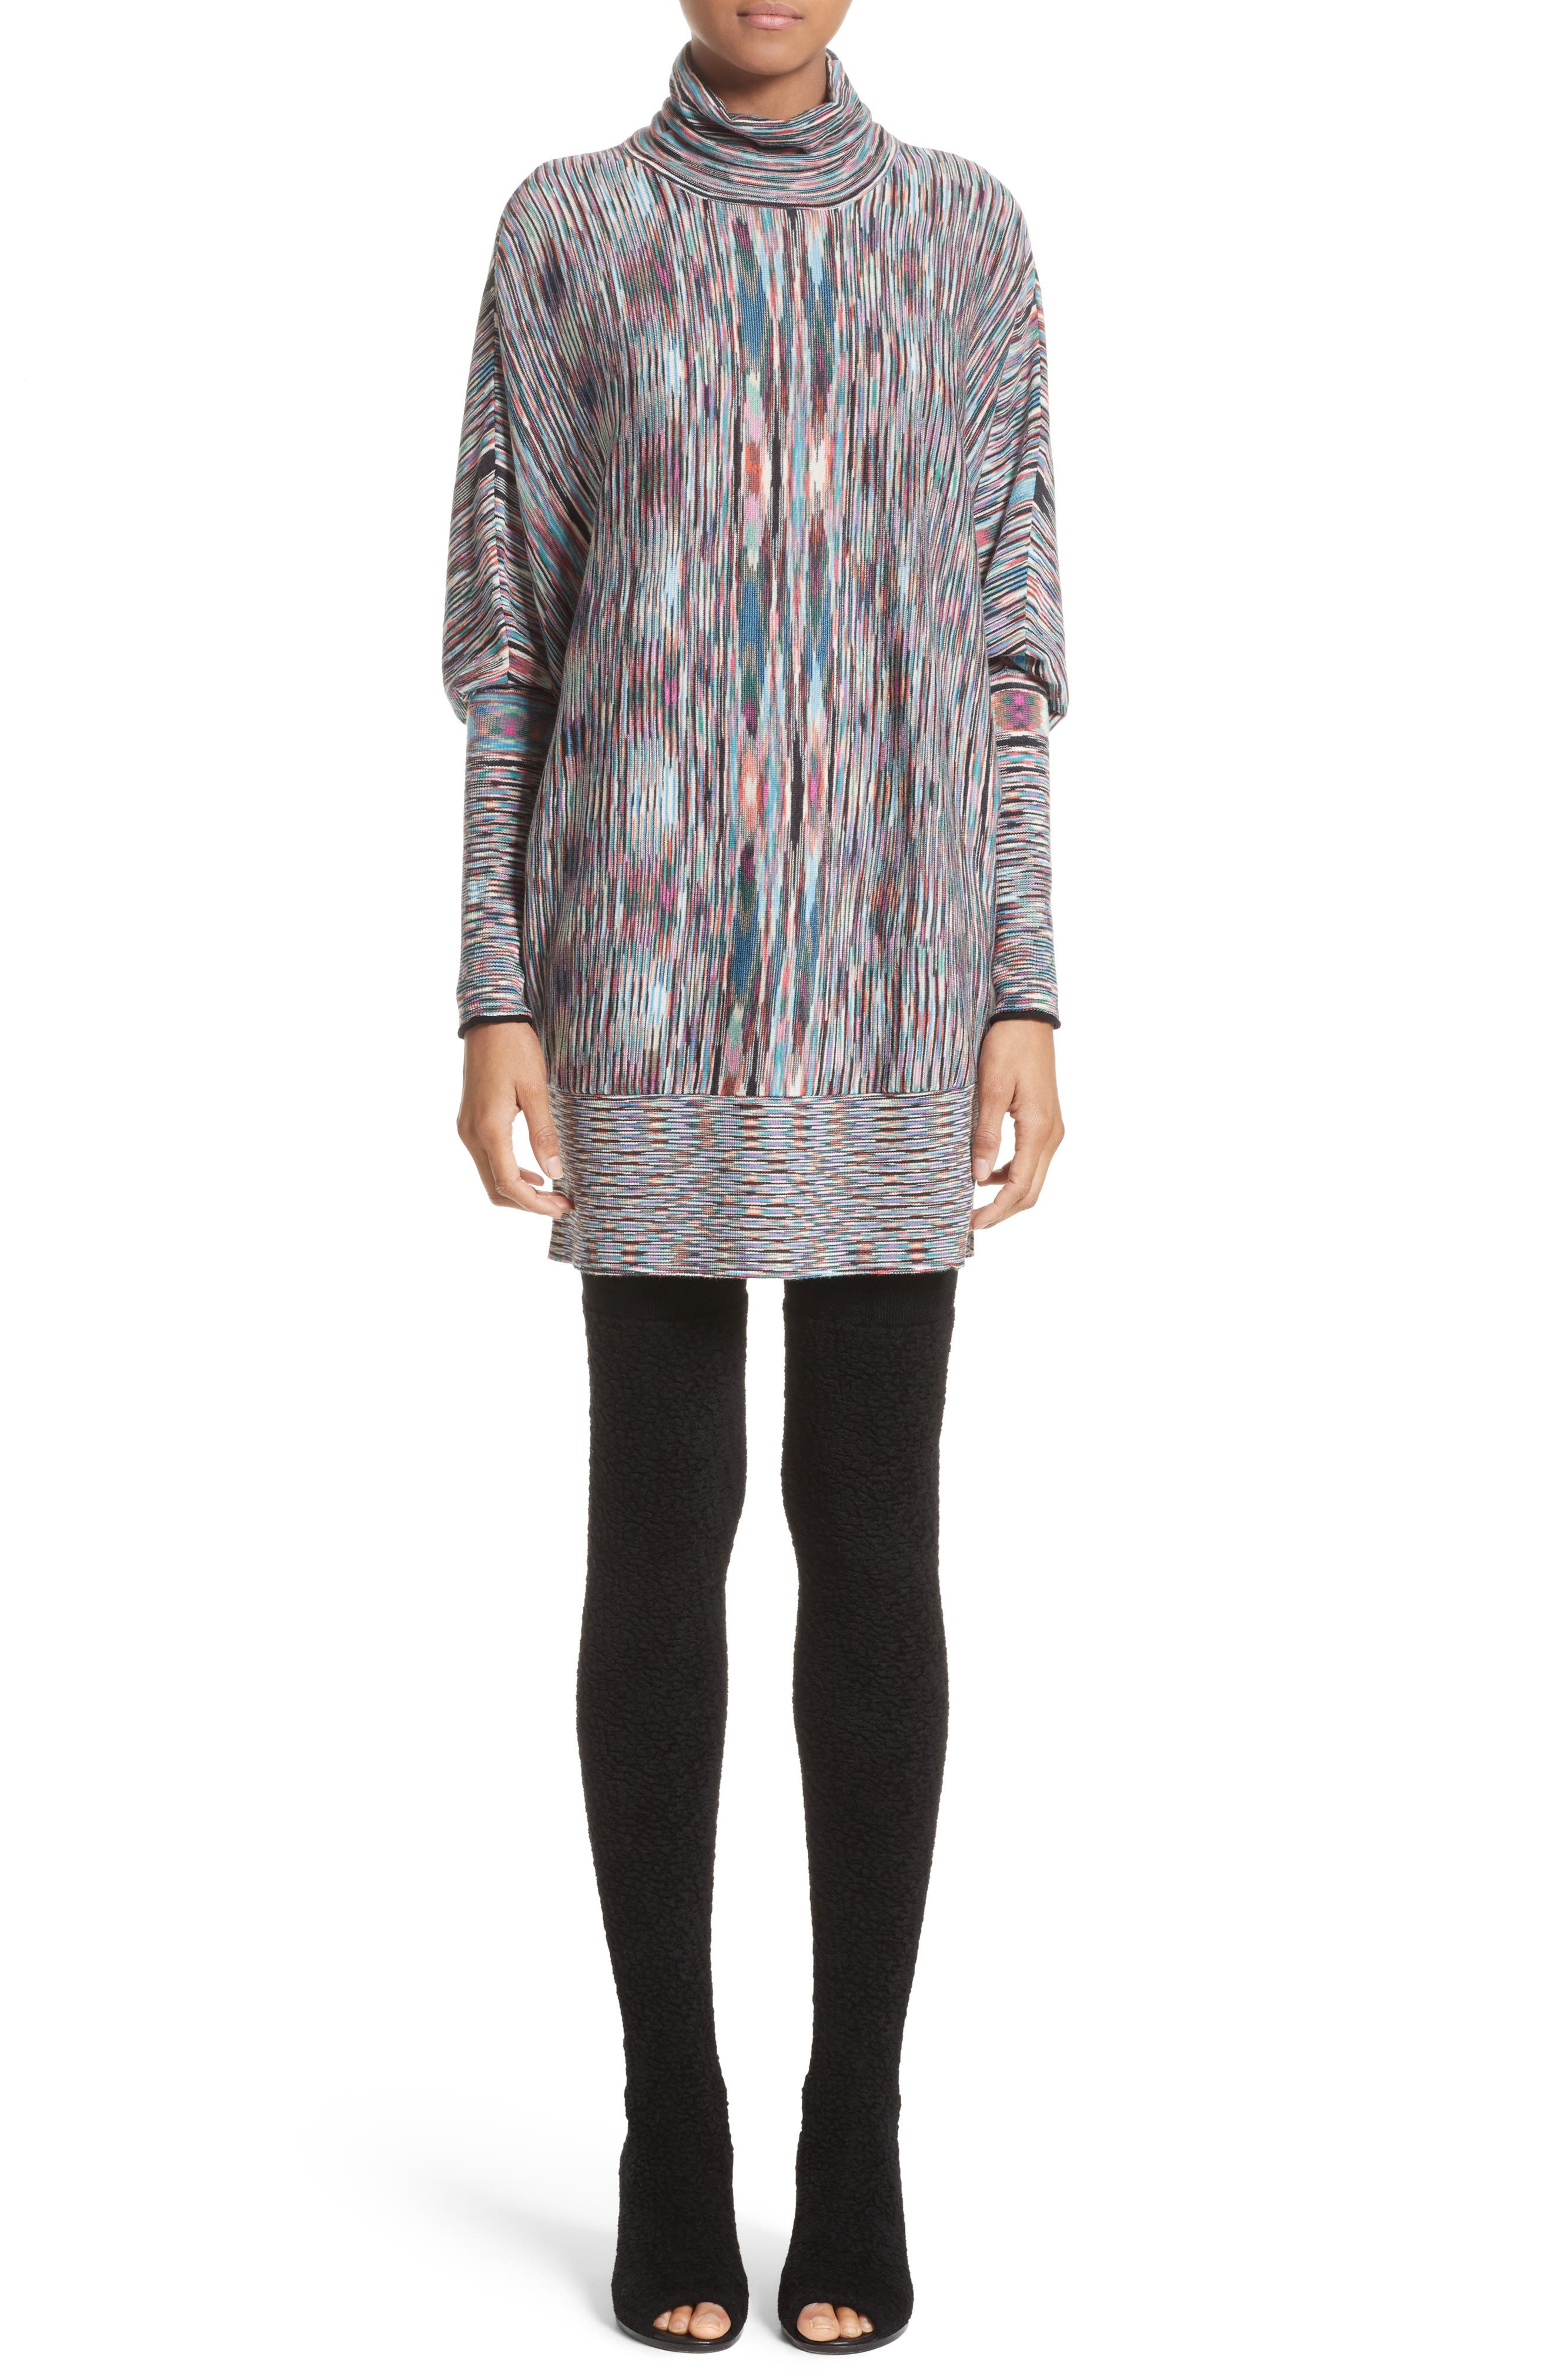 Space Dye Knit Dress,                         Main,                         color, 001